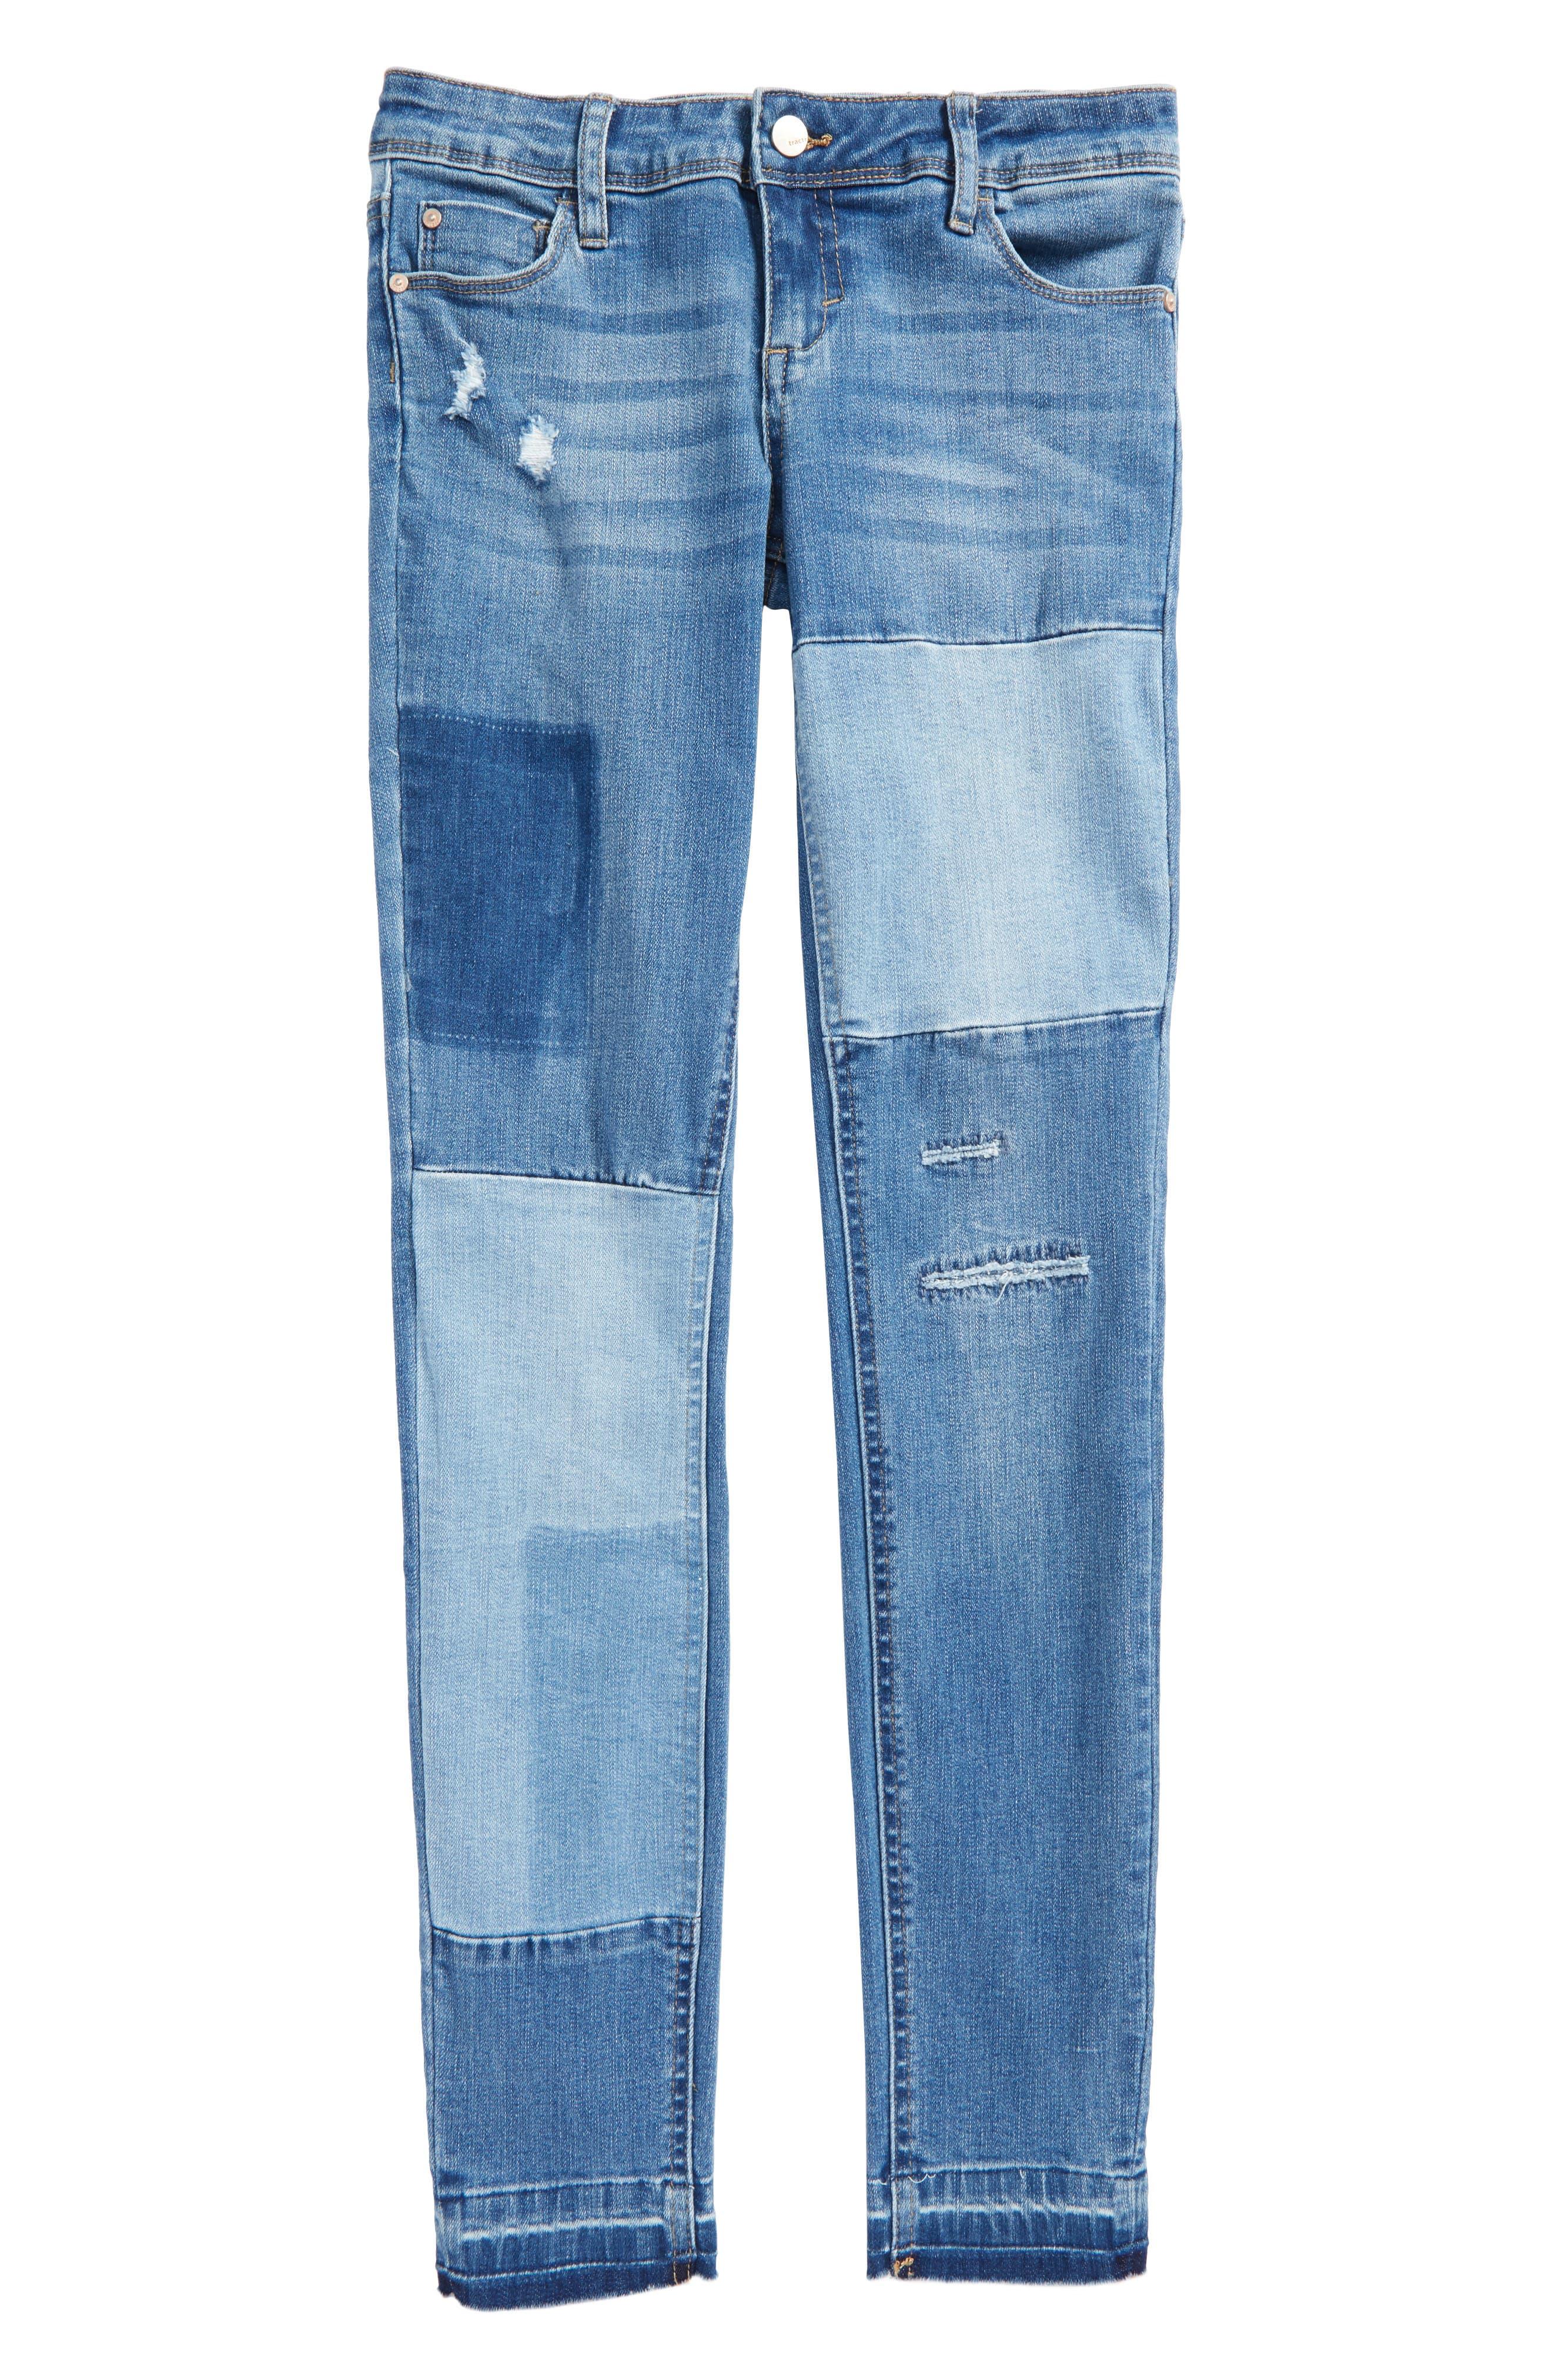 Patchwork Skinny Jeans,                         Main,                         color, Indigo